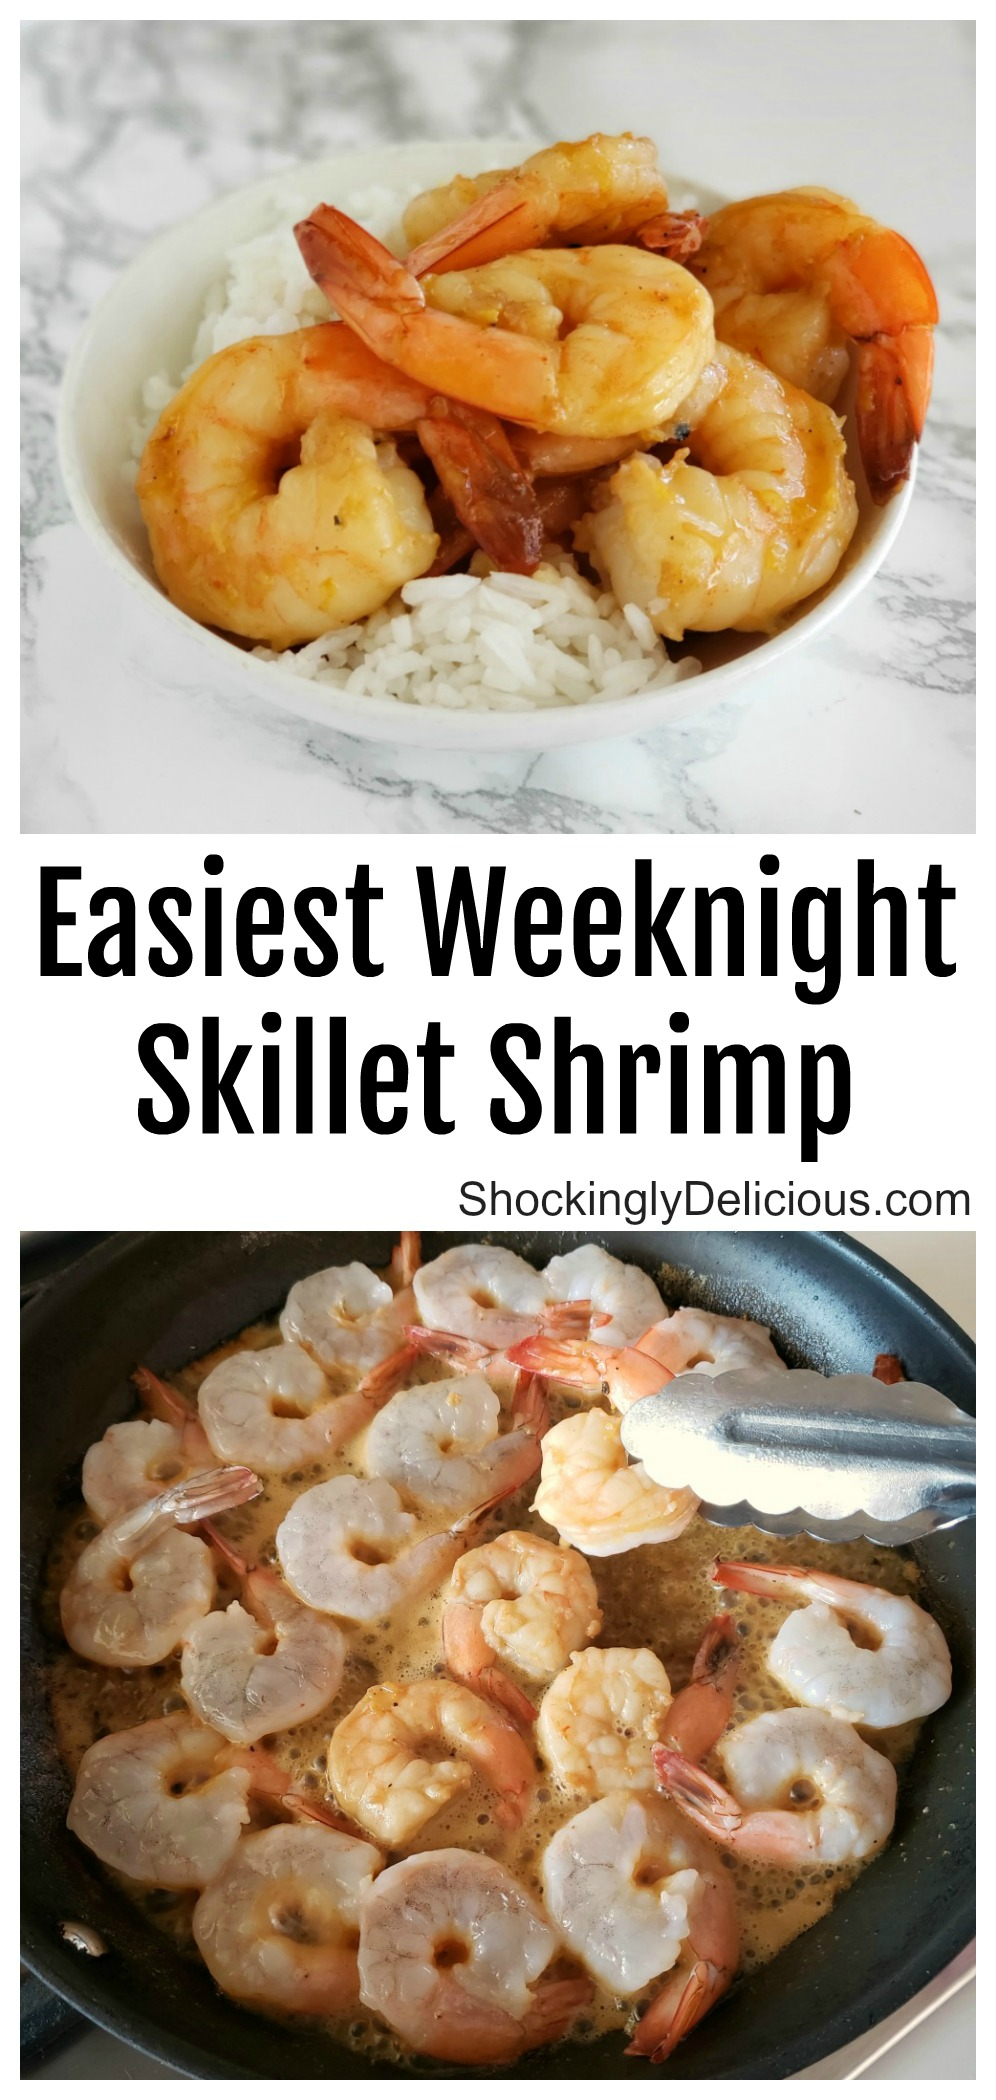 Easiest recipe Weeknight Skillet Shrimp on ShockinglyDelicious.com